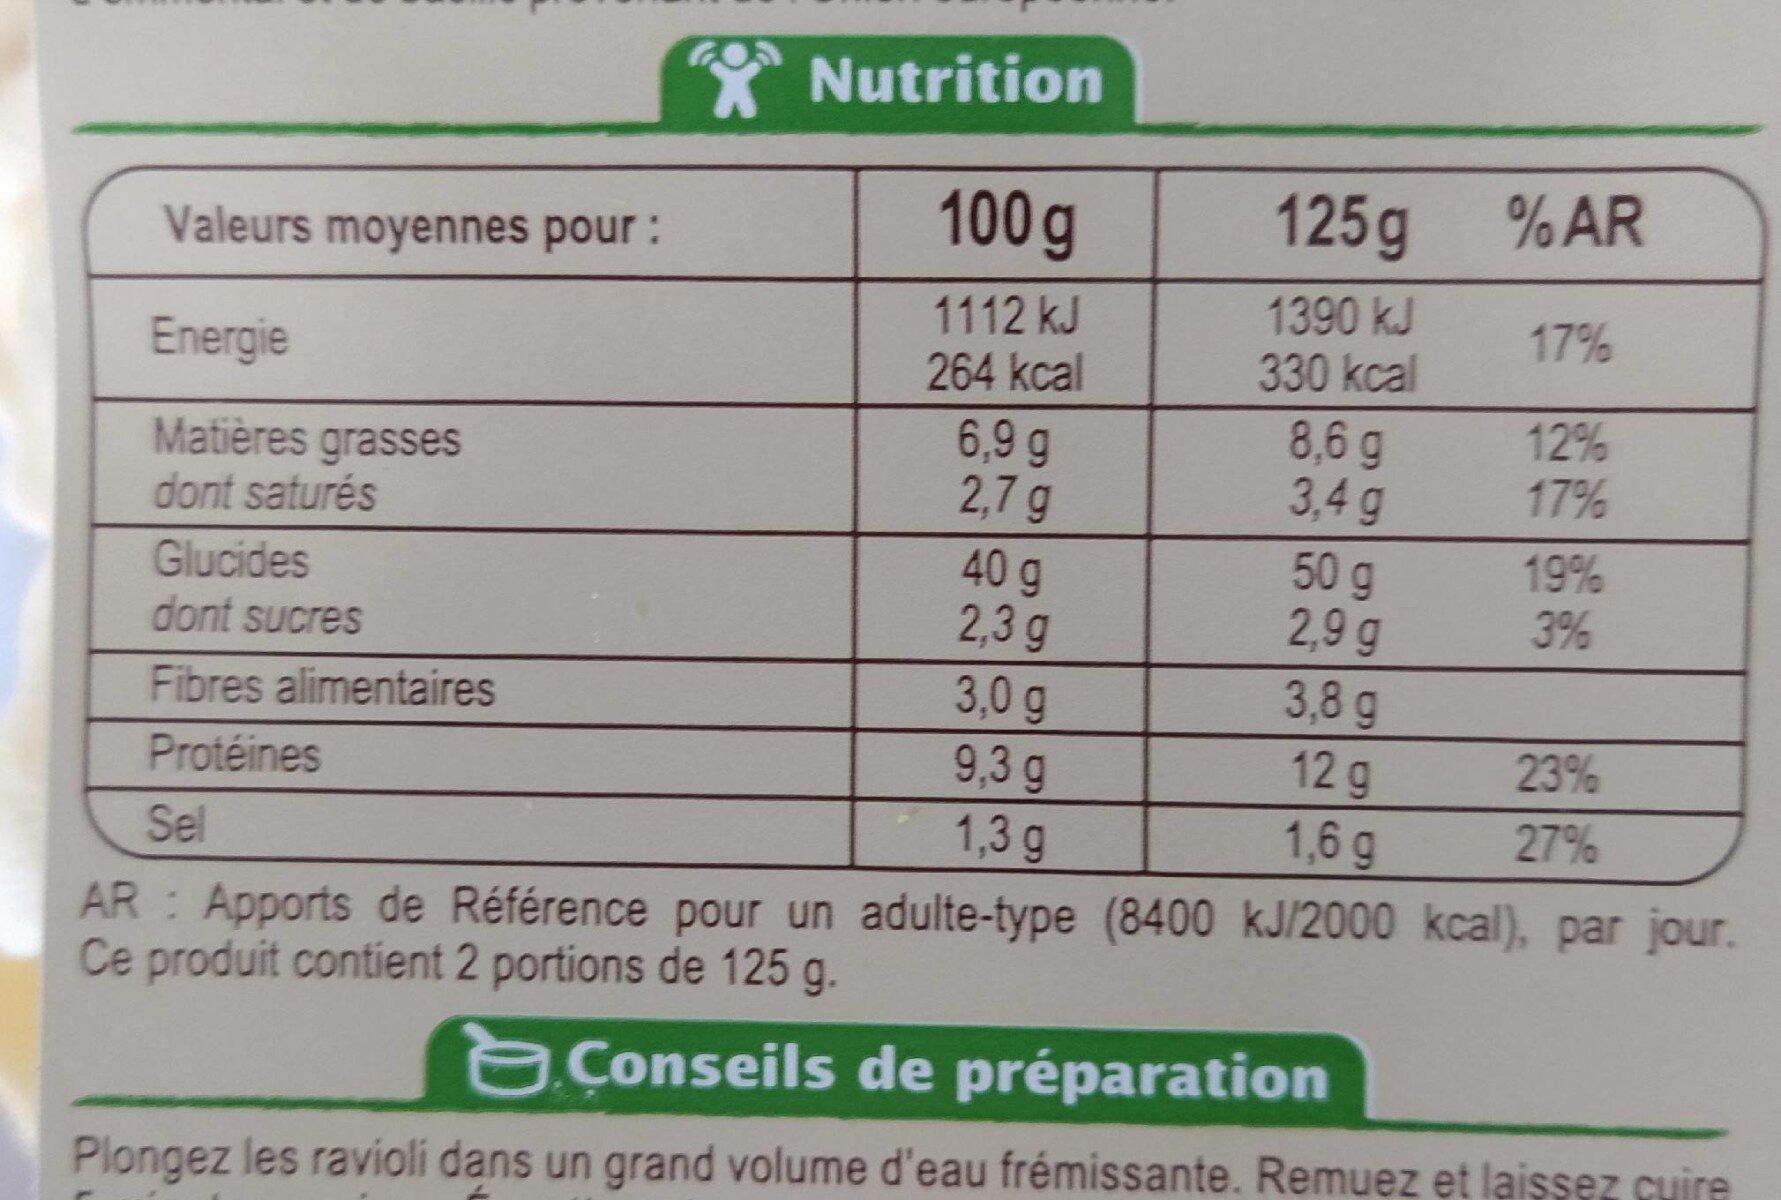 Pates fraiches Emmental basilic - Informations nutritionnelles - fr